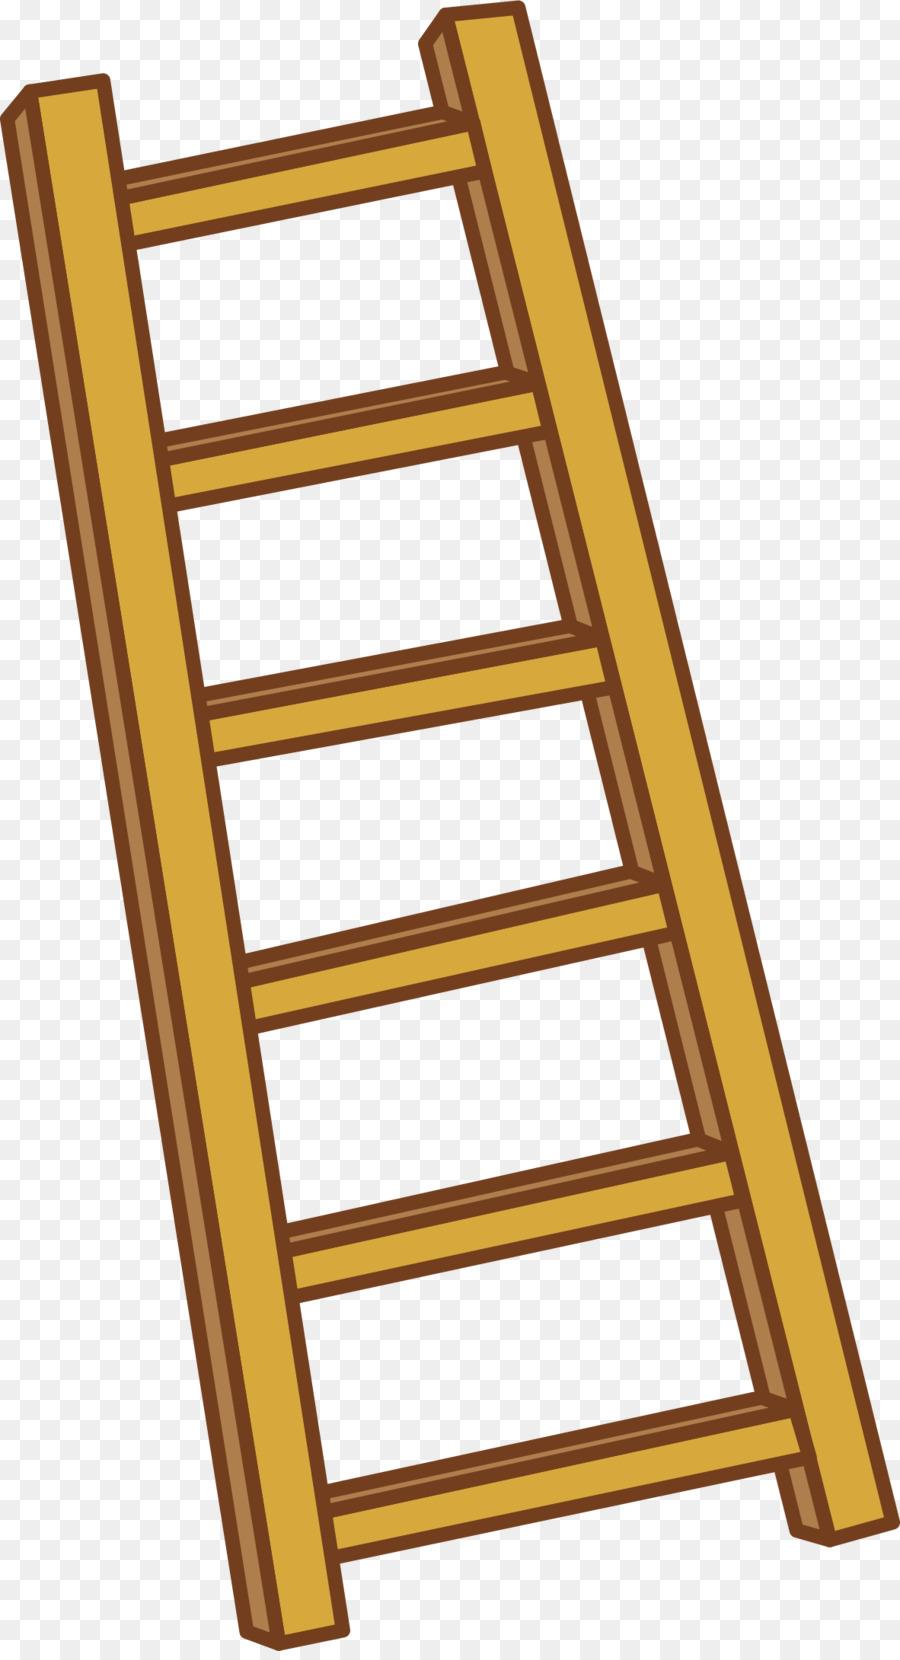 jpg library Clipart ladder. Cartoon wood rectangle